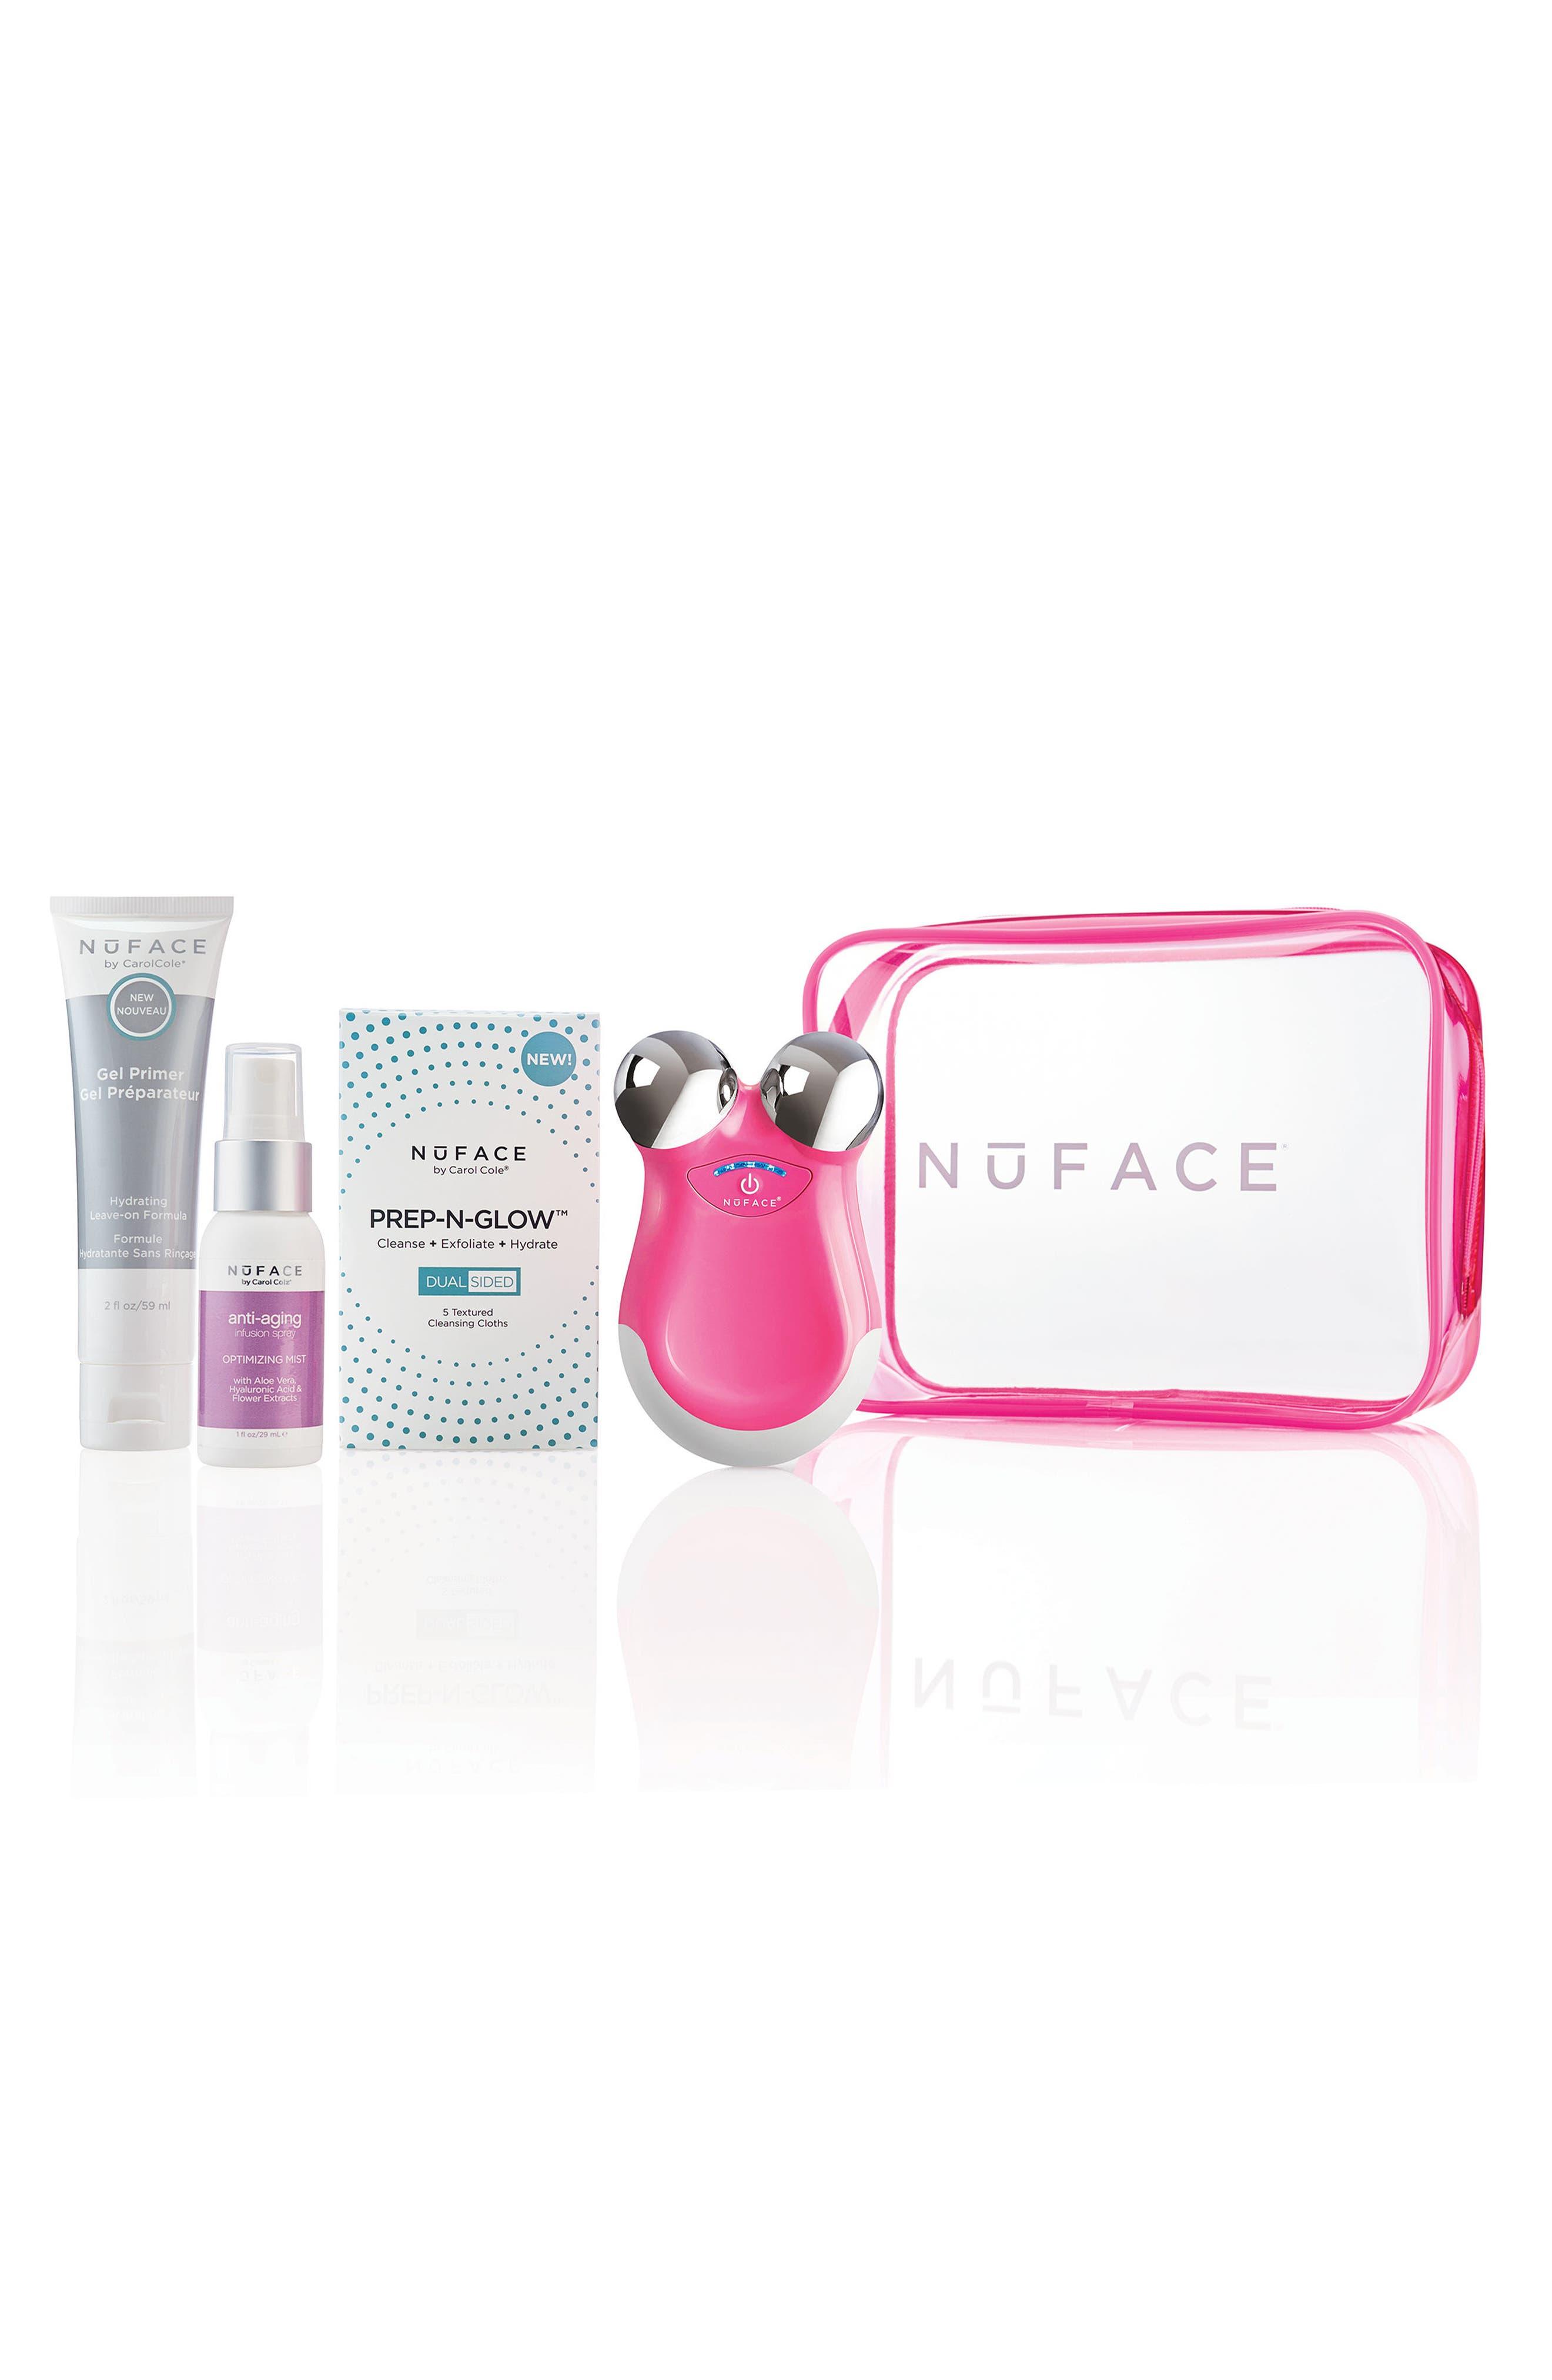 NuFACE mini Electric Pink Set,                             Main thumbnail 1, color,                             No Color